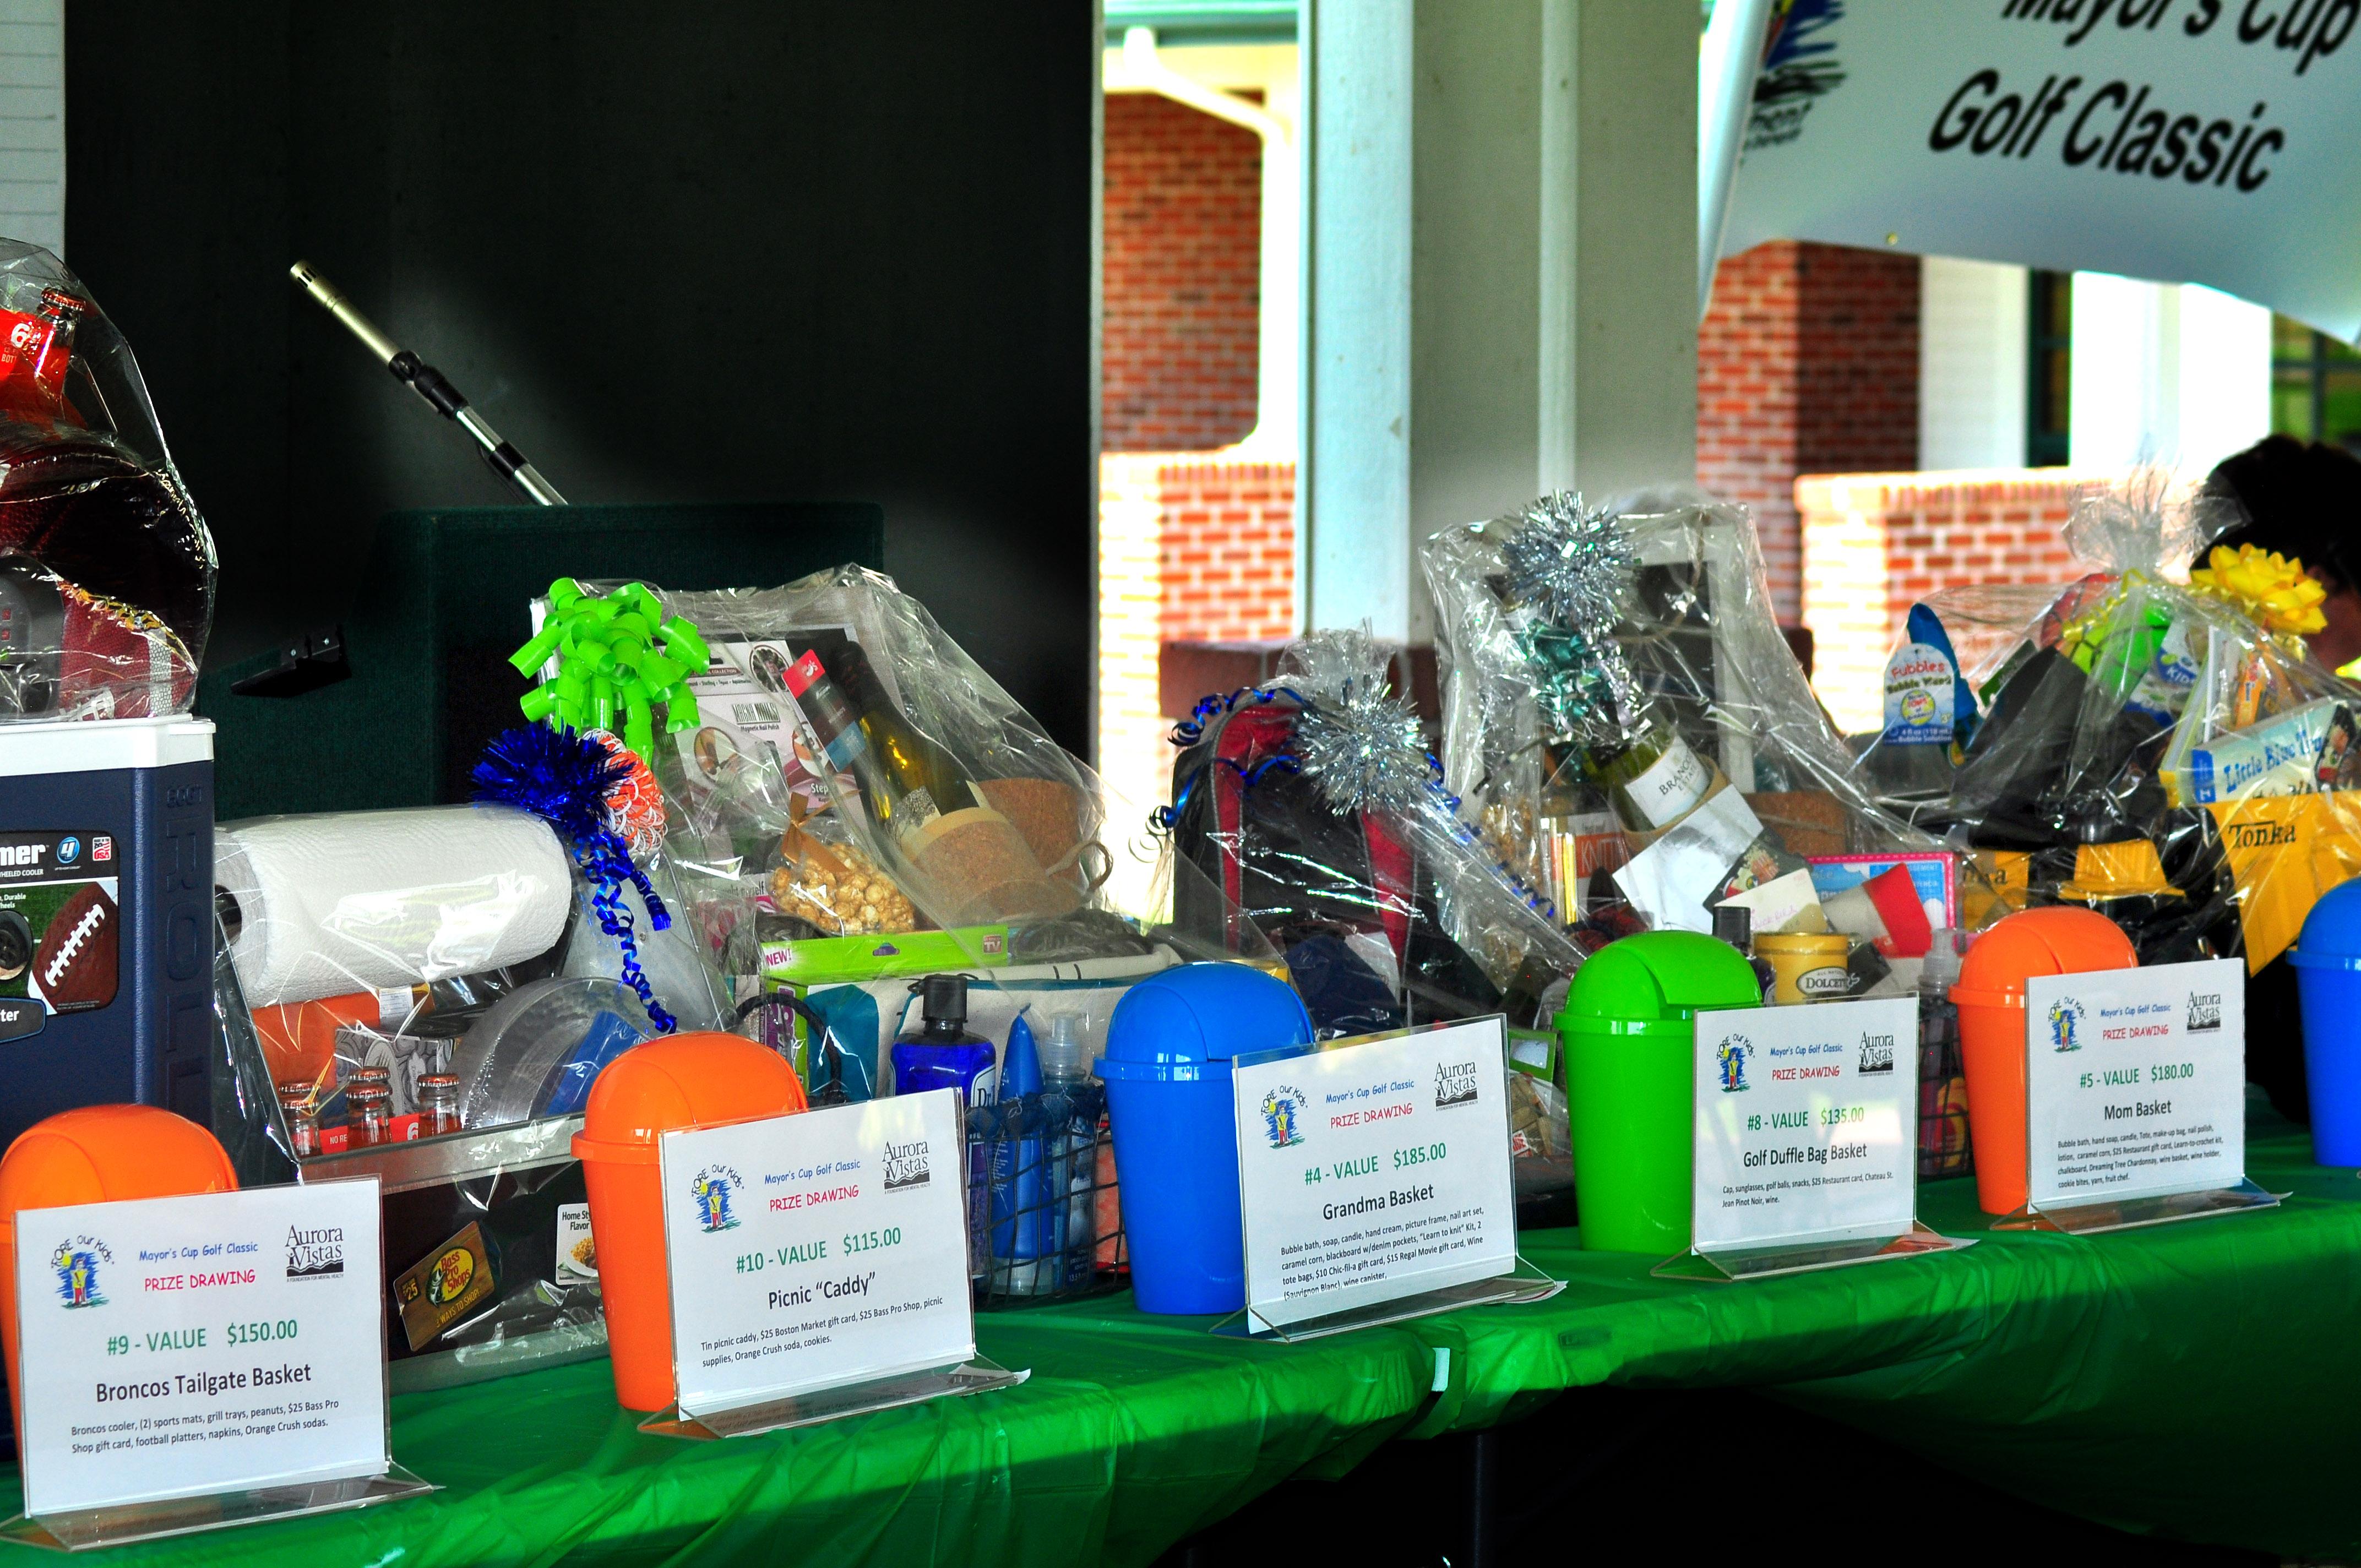 Generous sponsors provided gift bags